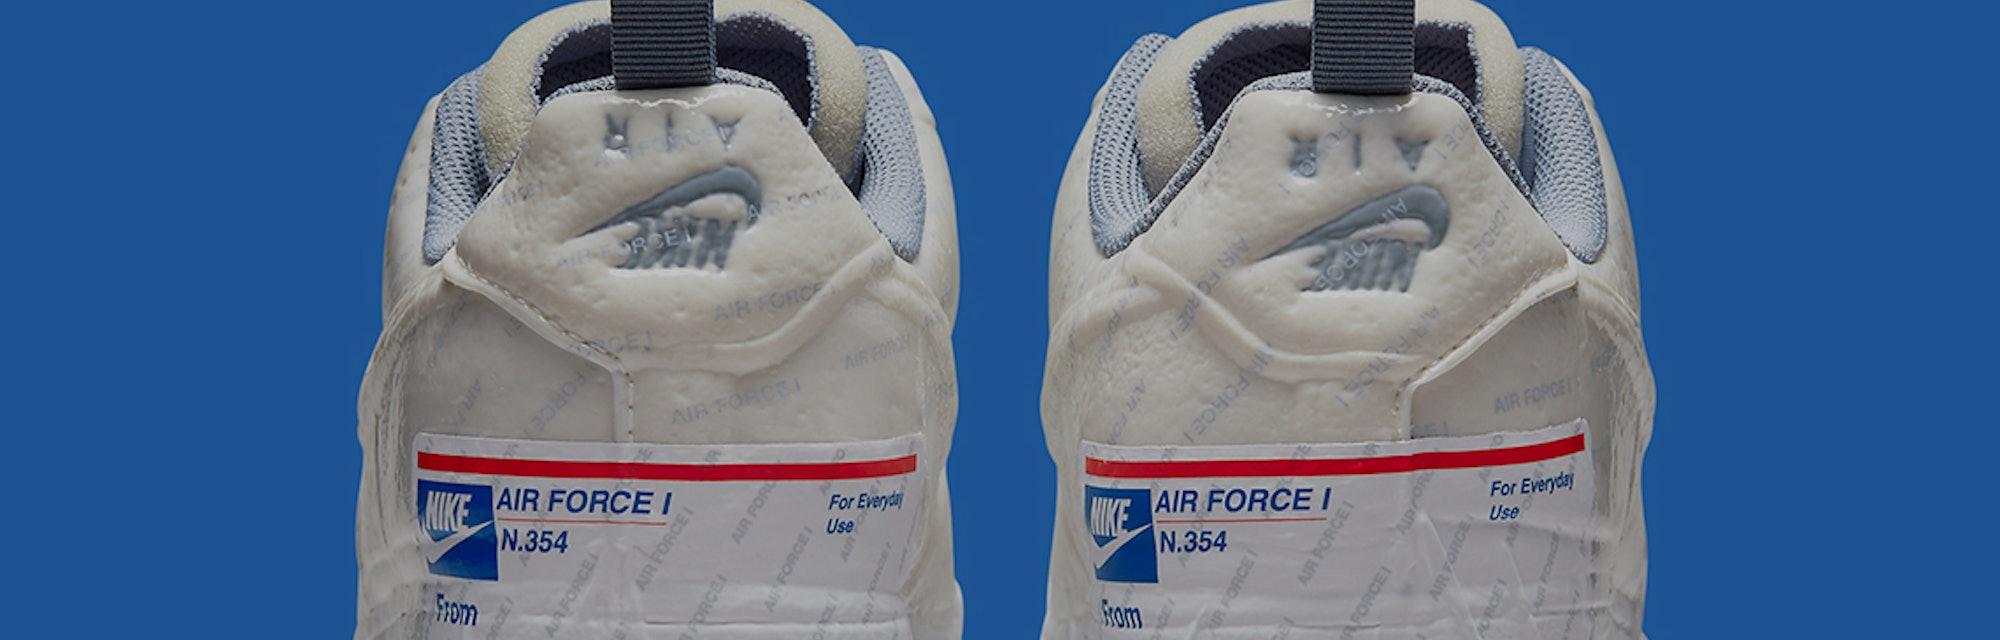 Nike Air Force 1 Experimental USPS